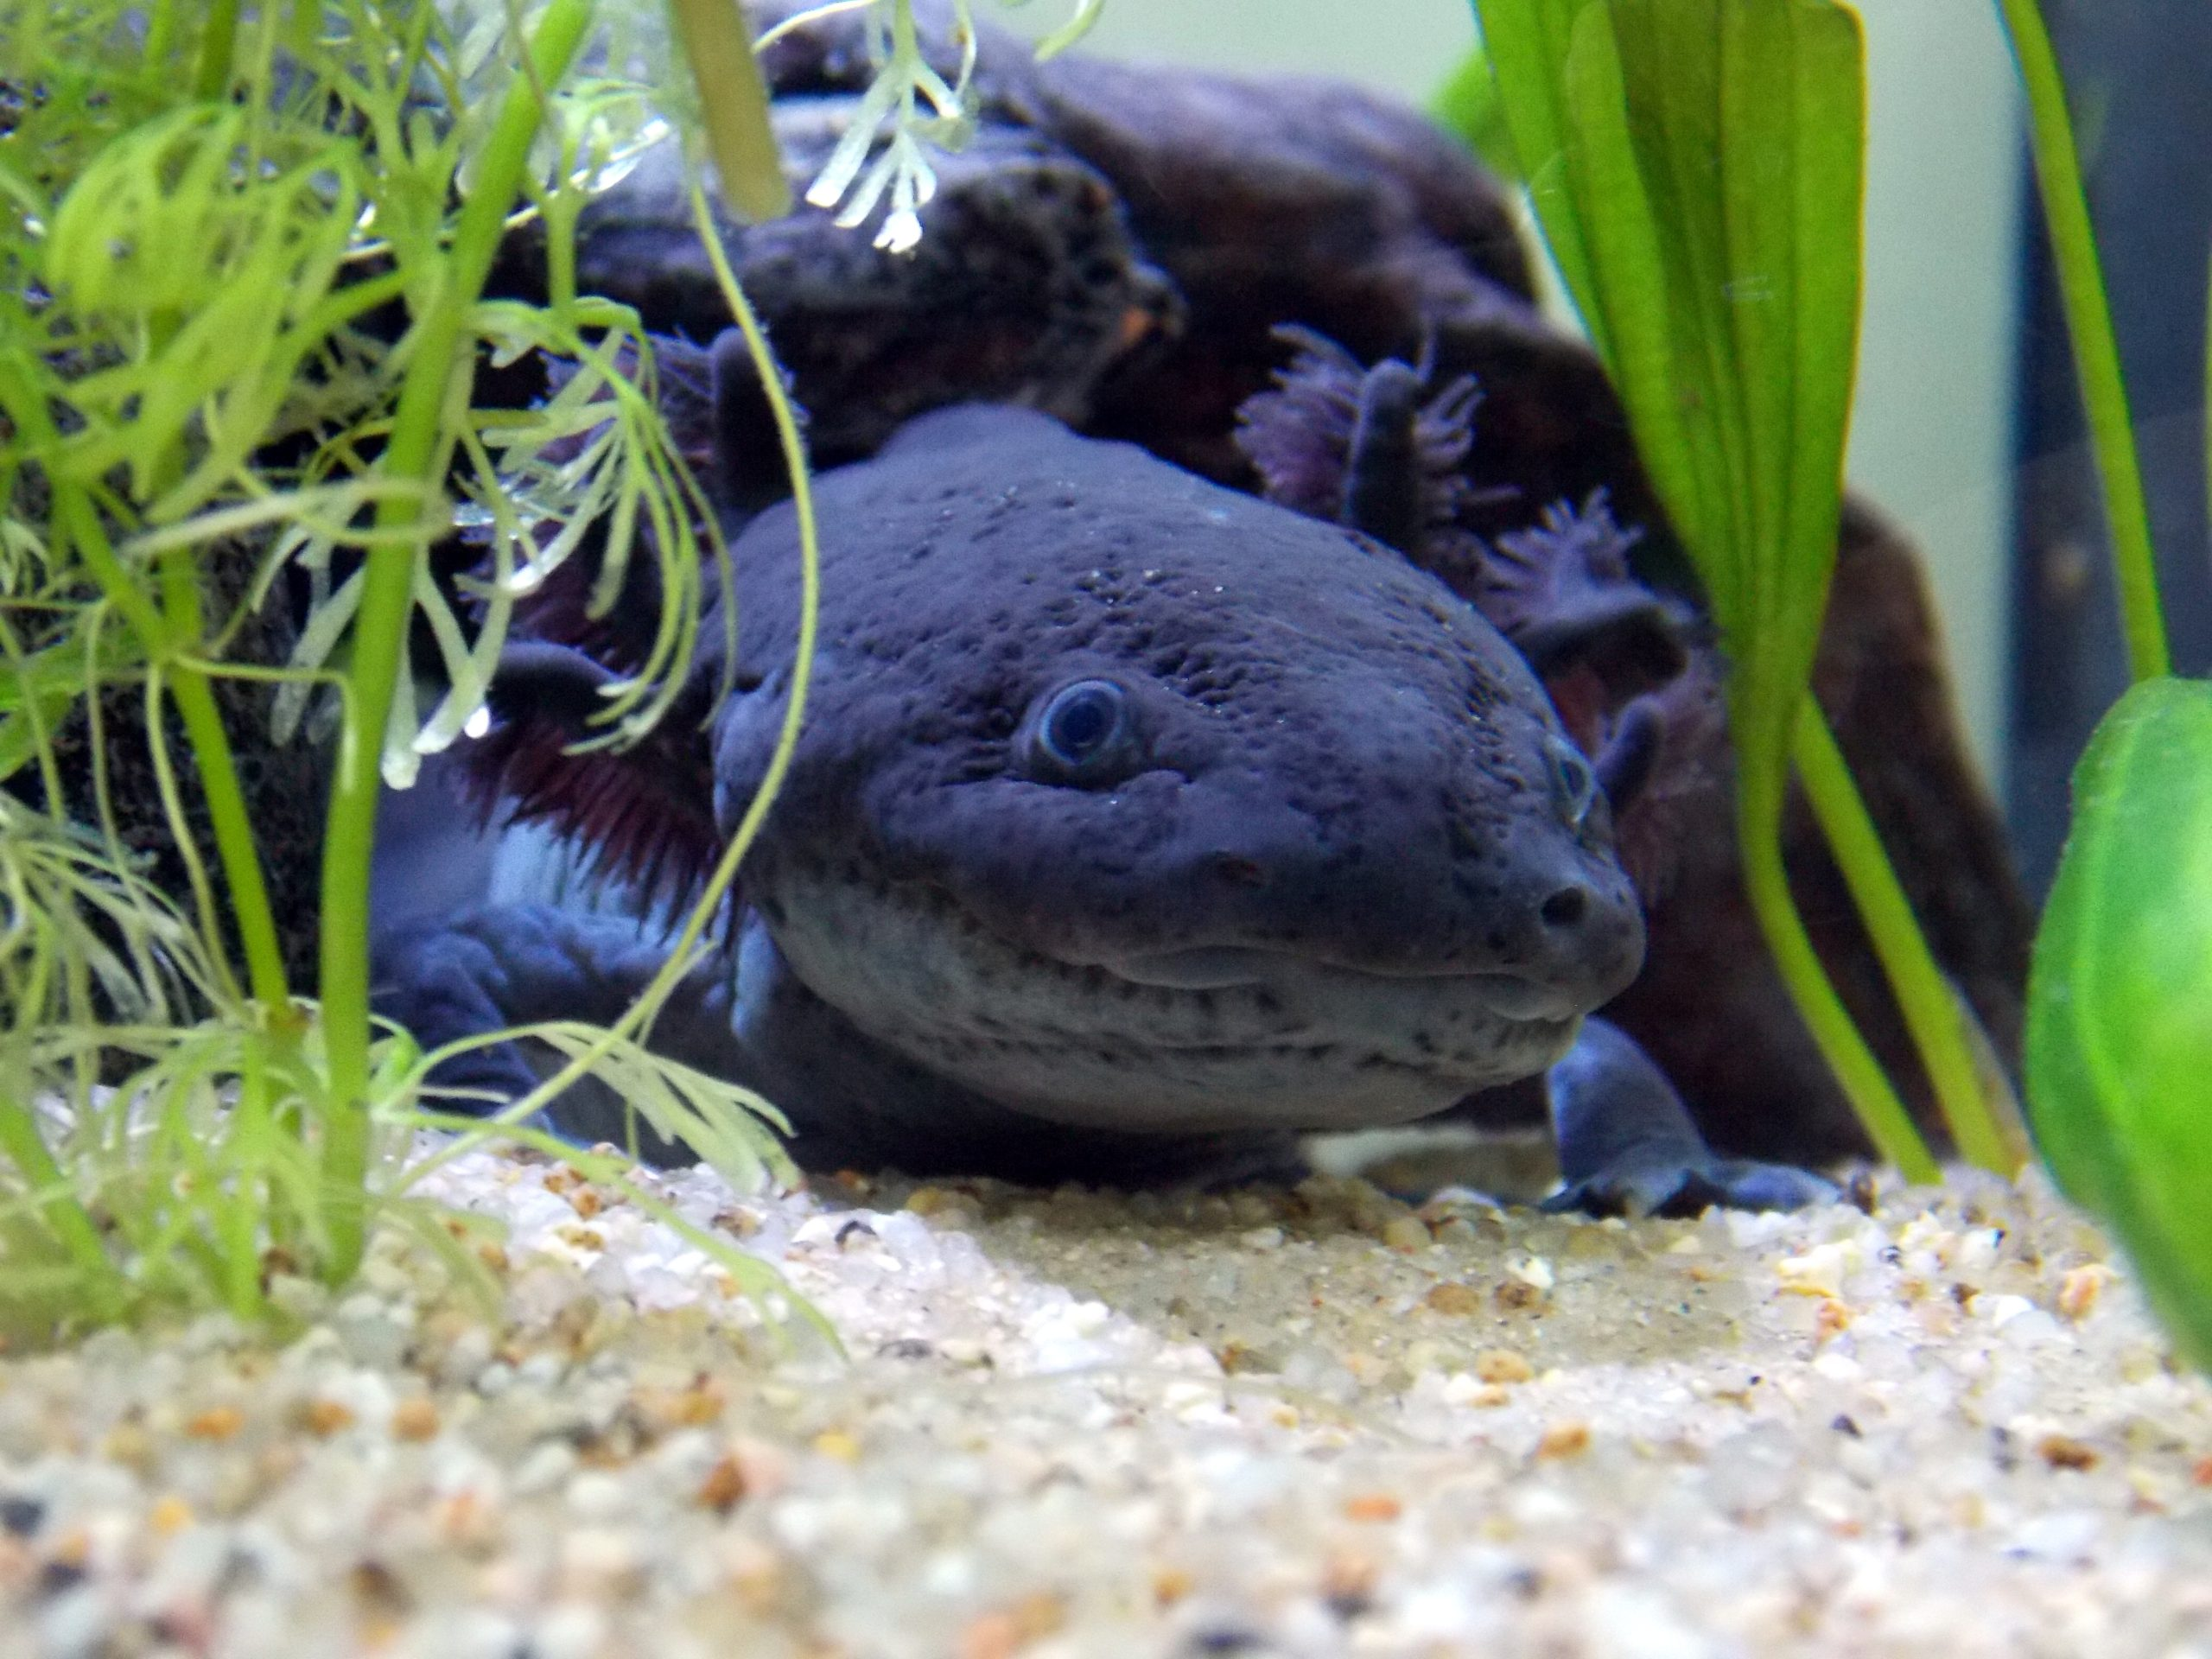 black axolotl wallpaper with green plants Loud Wallpapers 2560x1920